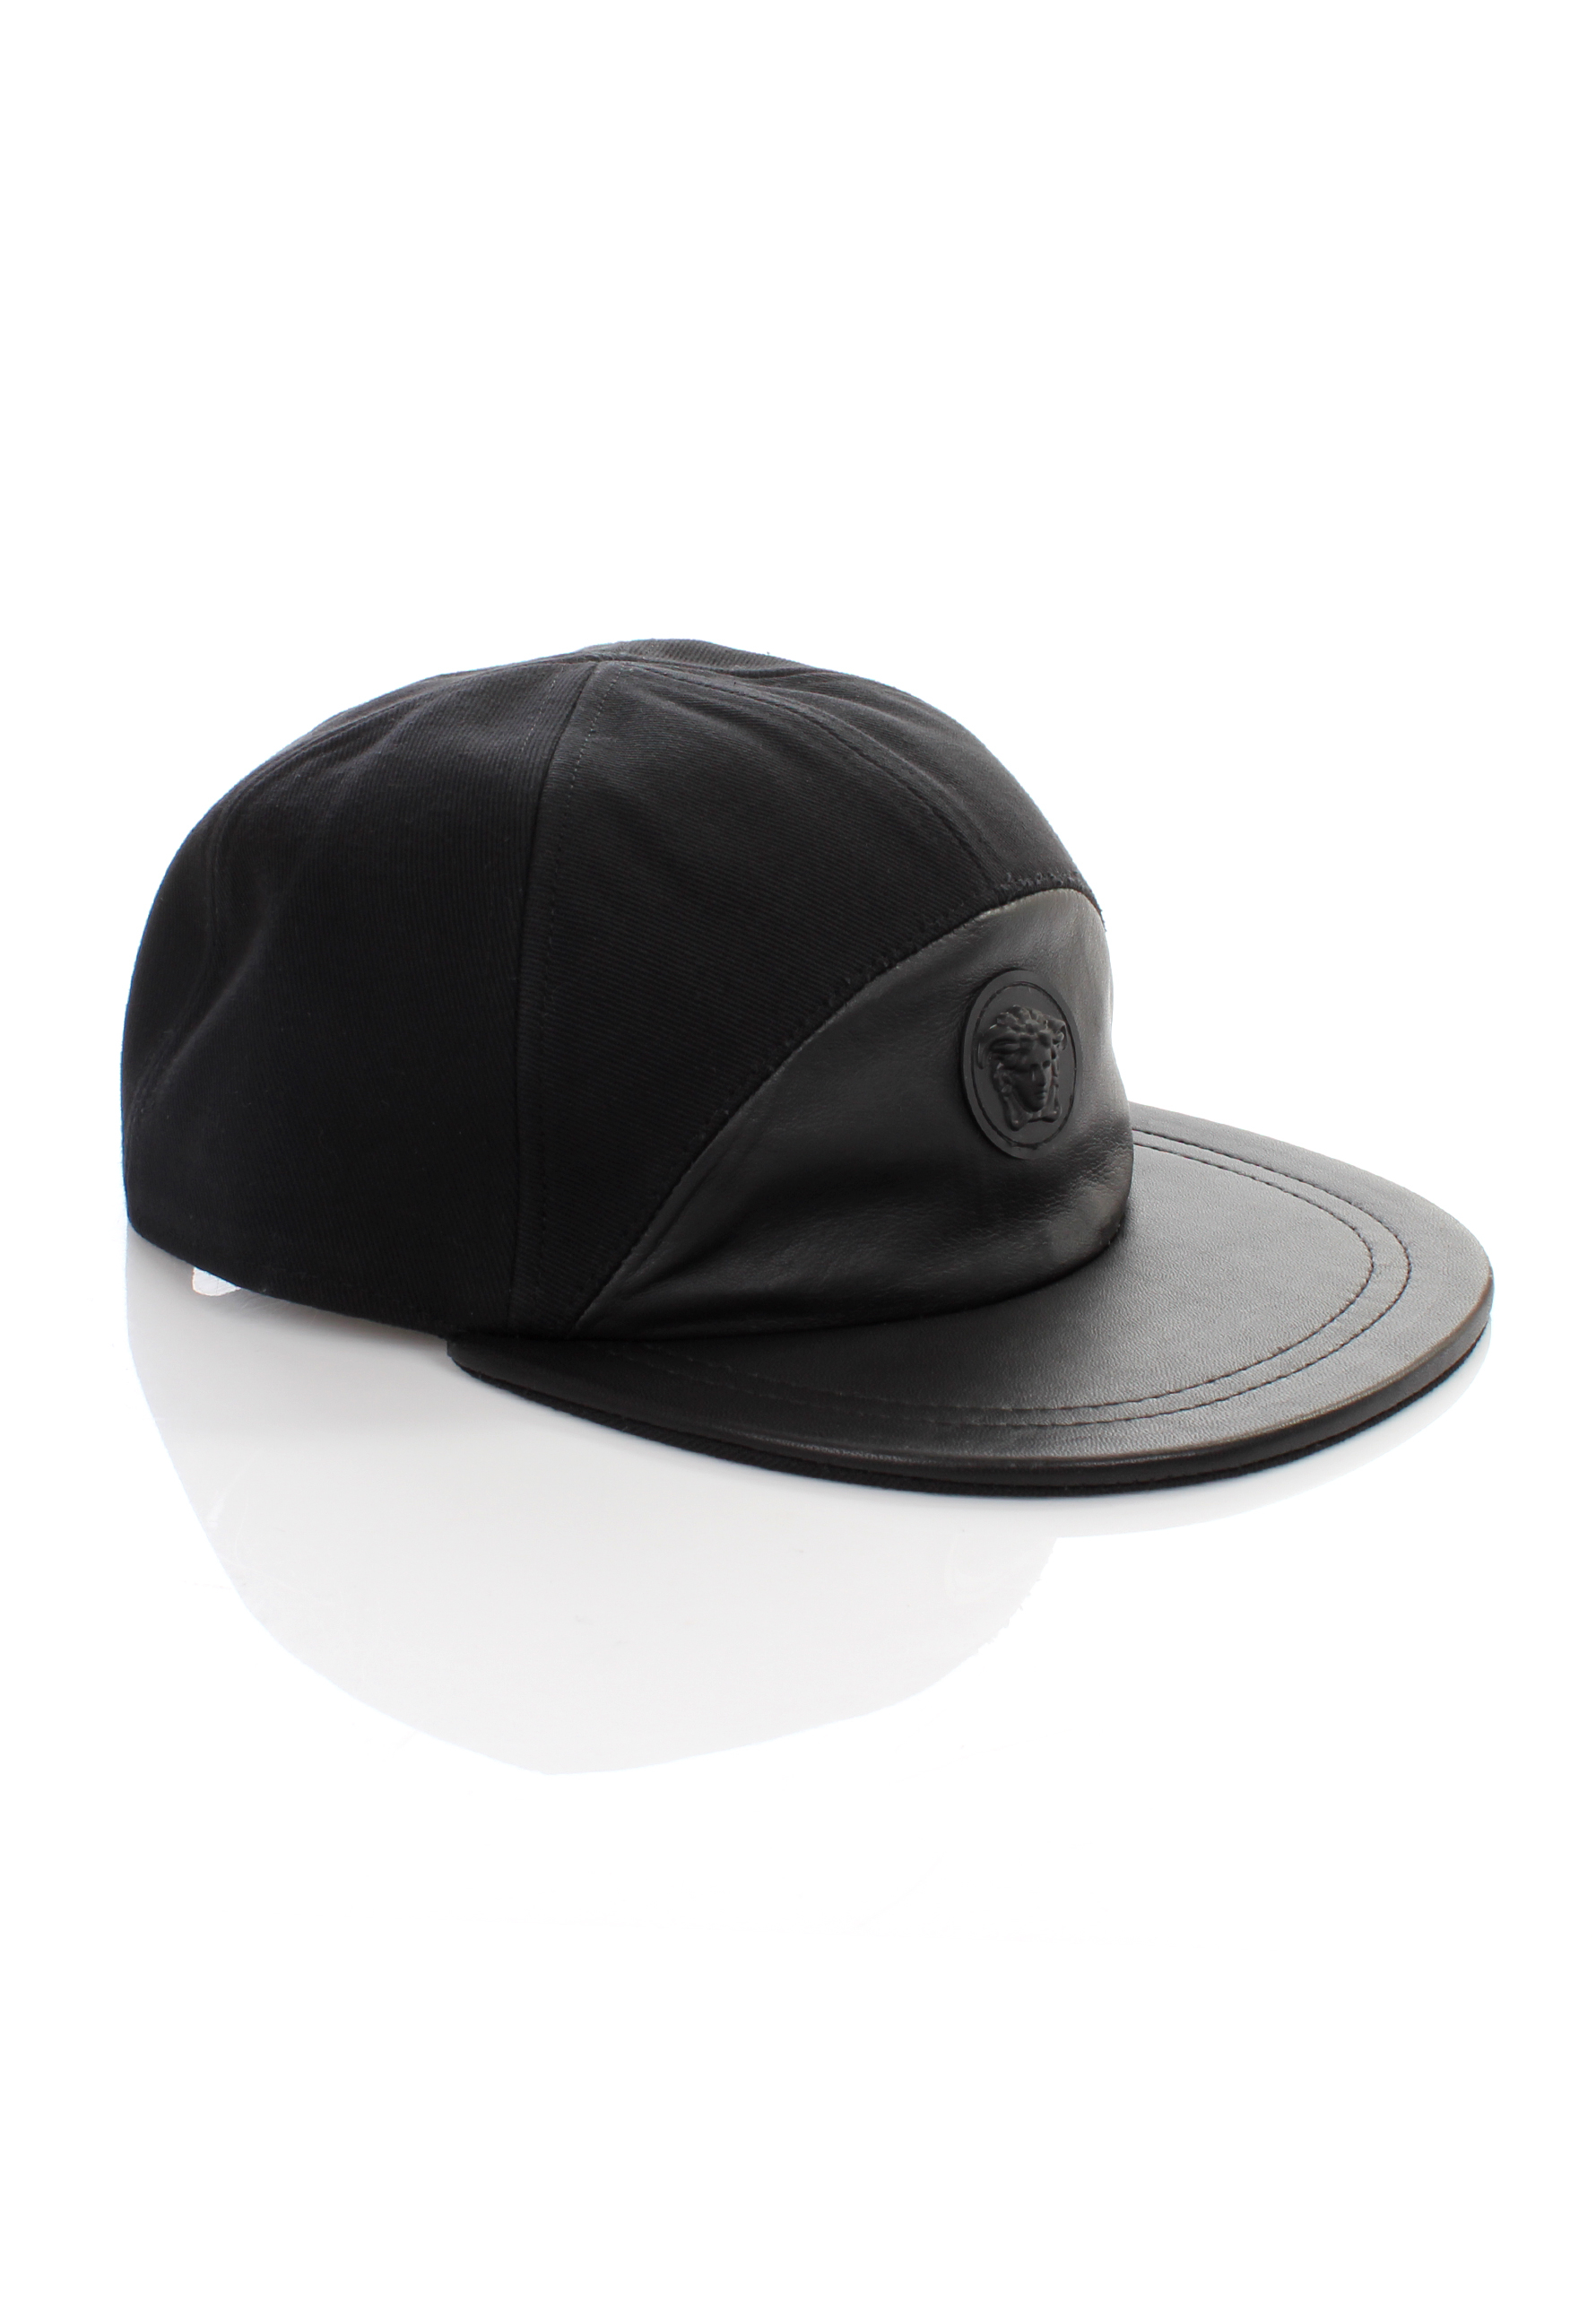 Versace Medusa Logo Half Leather Cap Nero in Black for Men - Lyst 1fd98c0076e